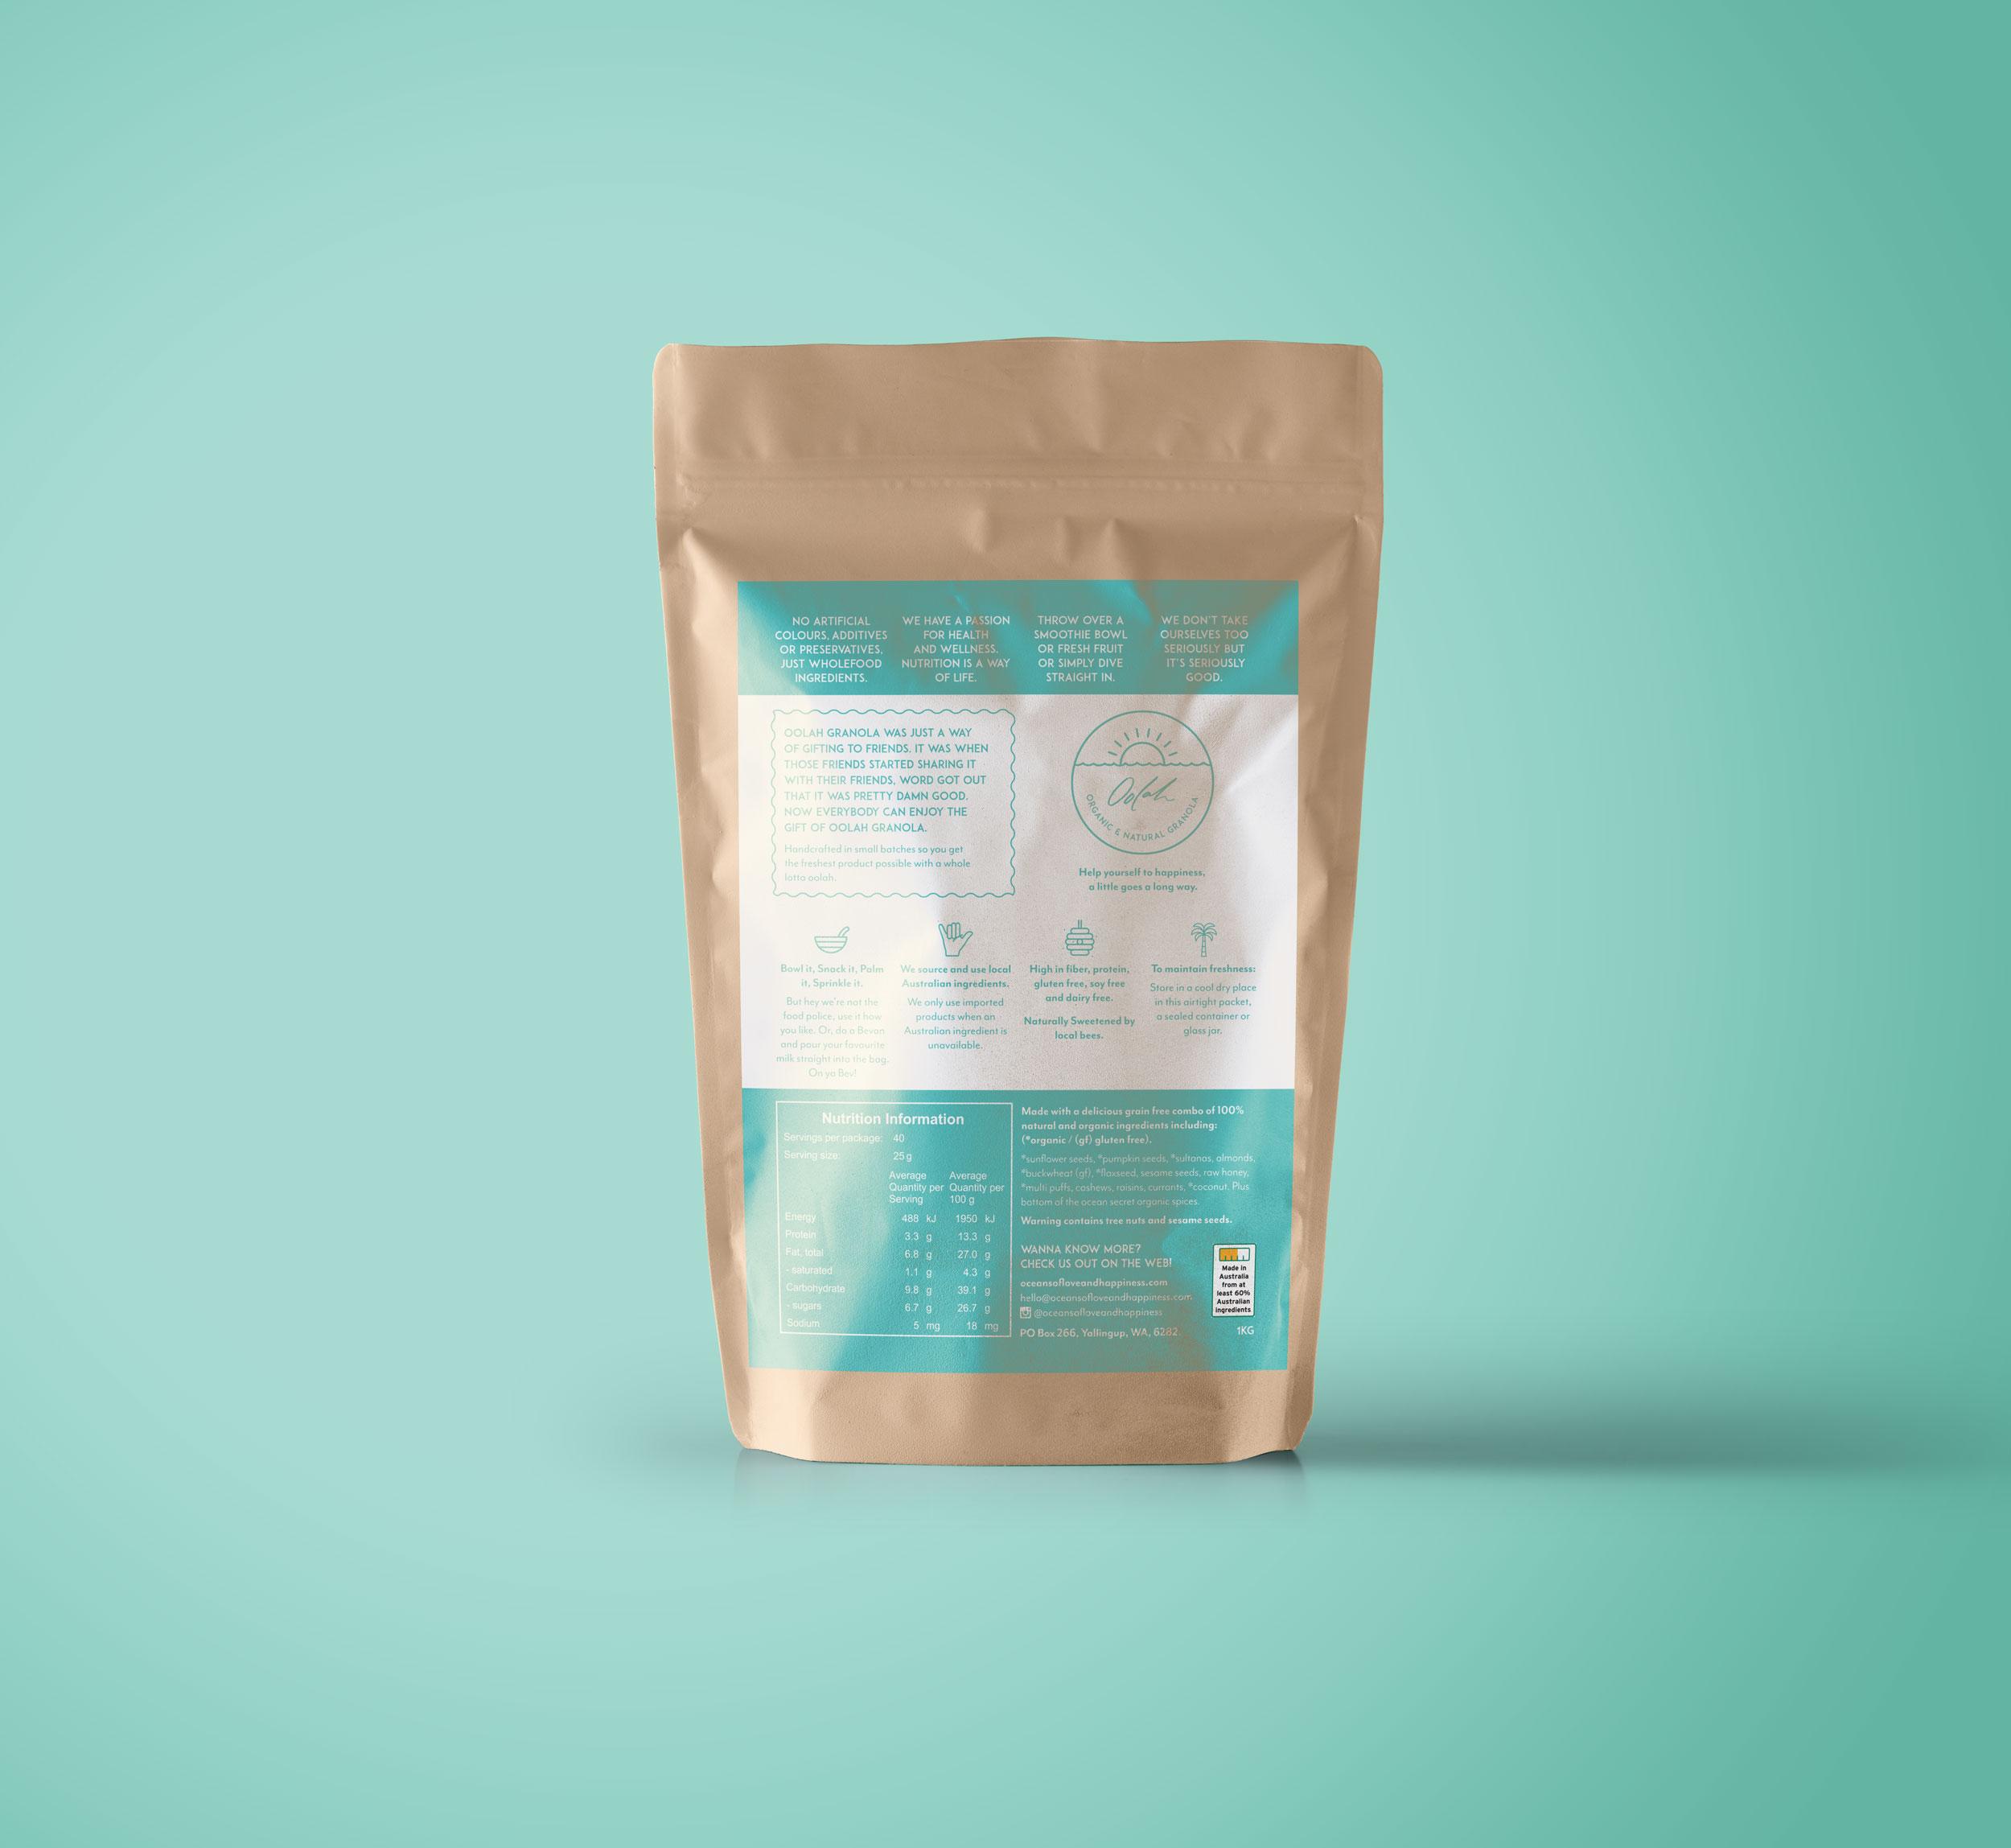 Oolah_Granola_Packaging_Back.jpg